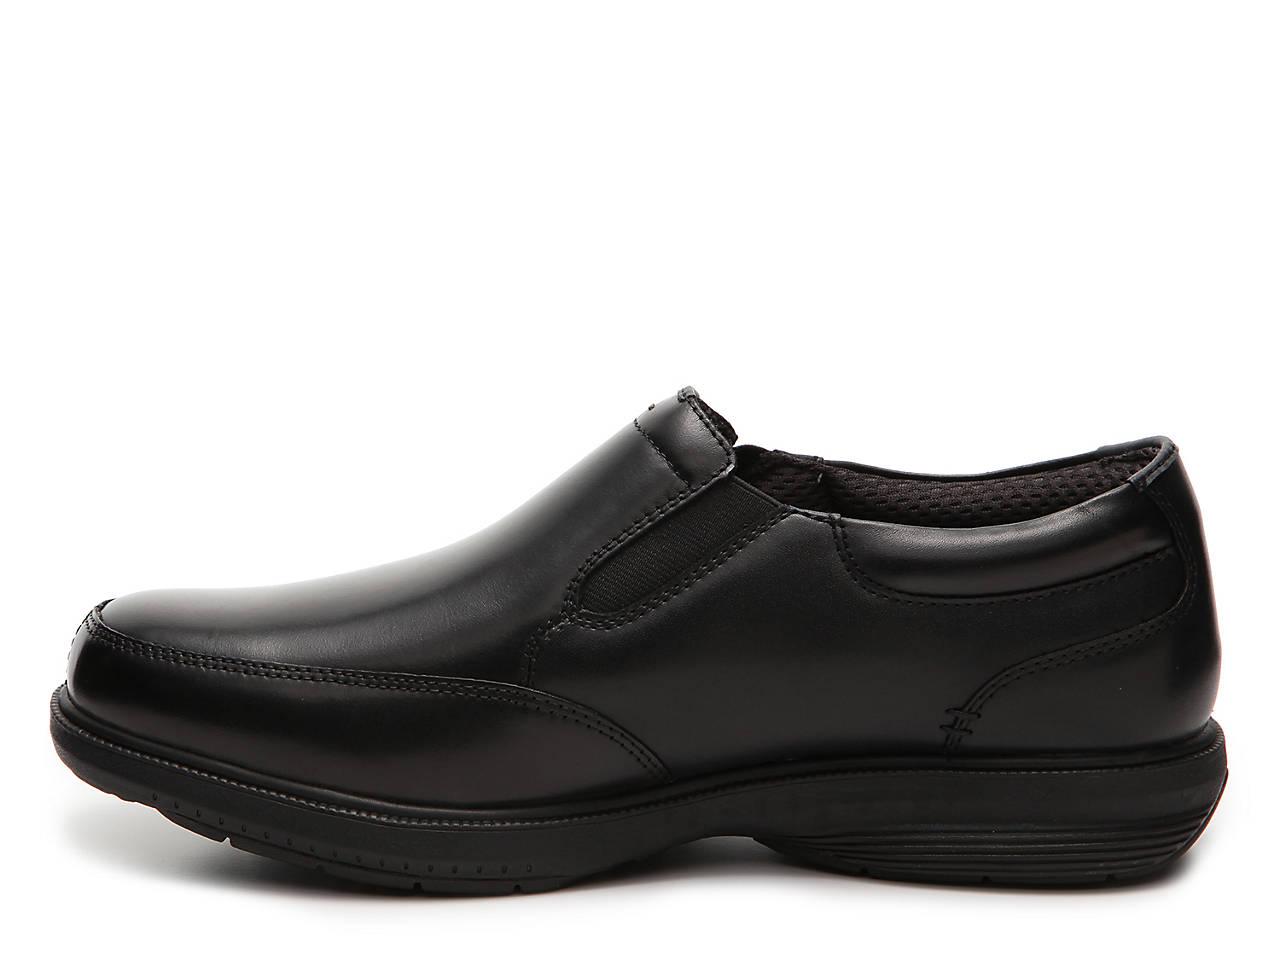 5f0aed7c16 Nunn Bush Myles St. Slip-On Men s Shoes